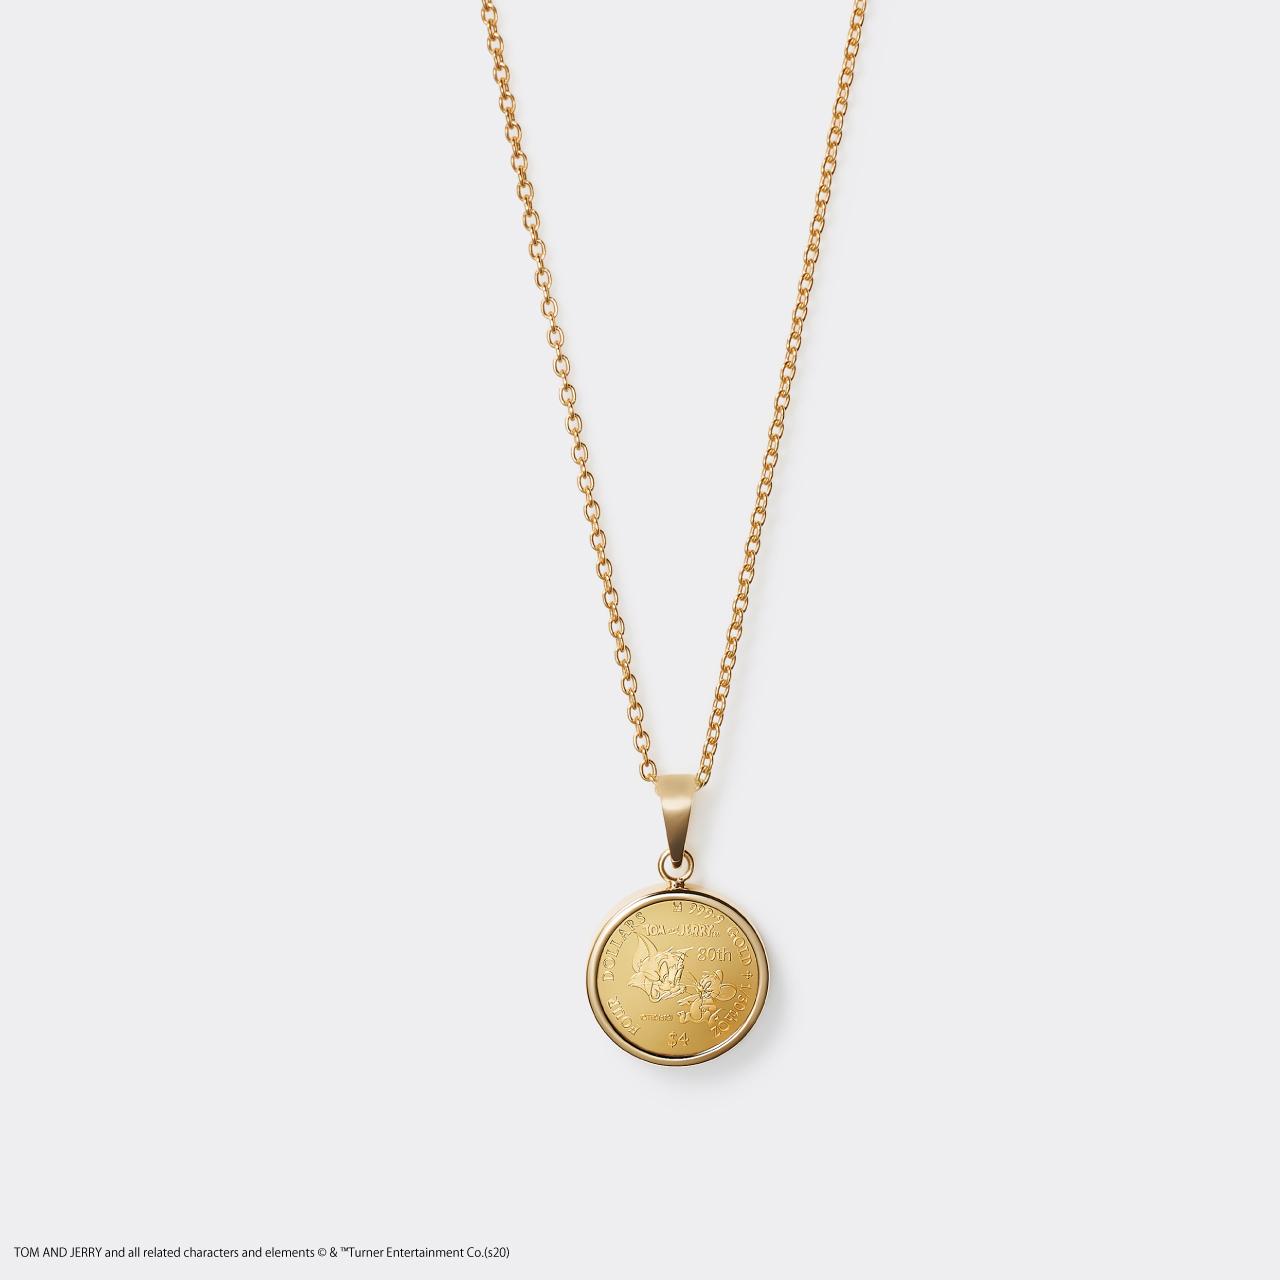 2020 TOM&JERRY 1/30 GOLD PROOF COIN NECKLACE(トムとジェリー 80周年記念硬貨ネックレス 1/30オンス)